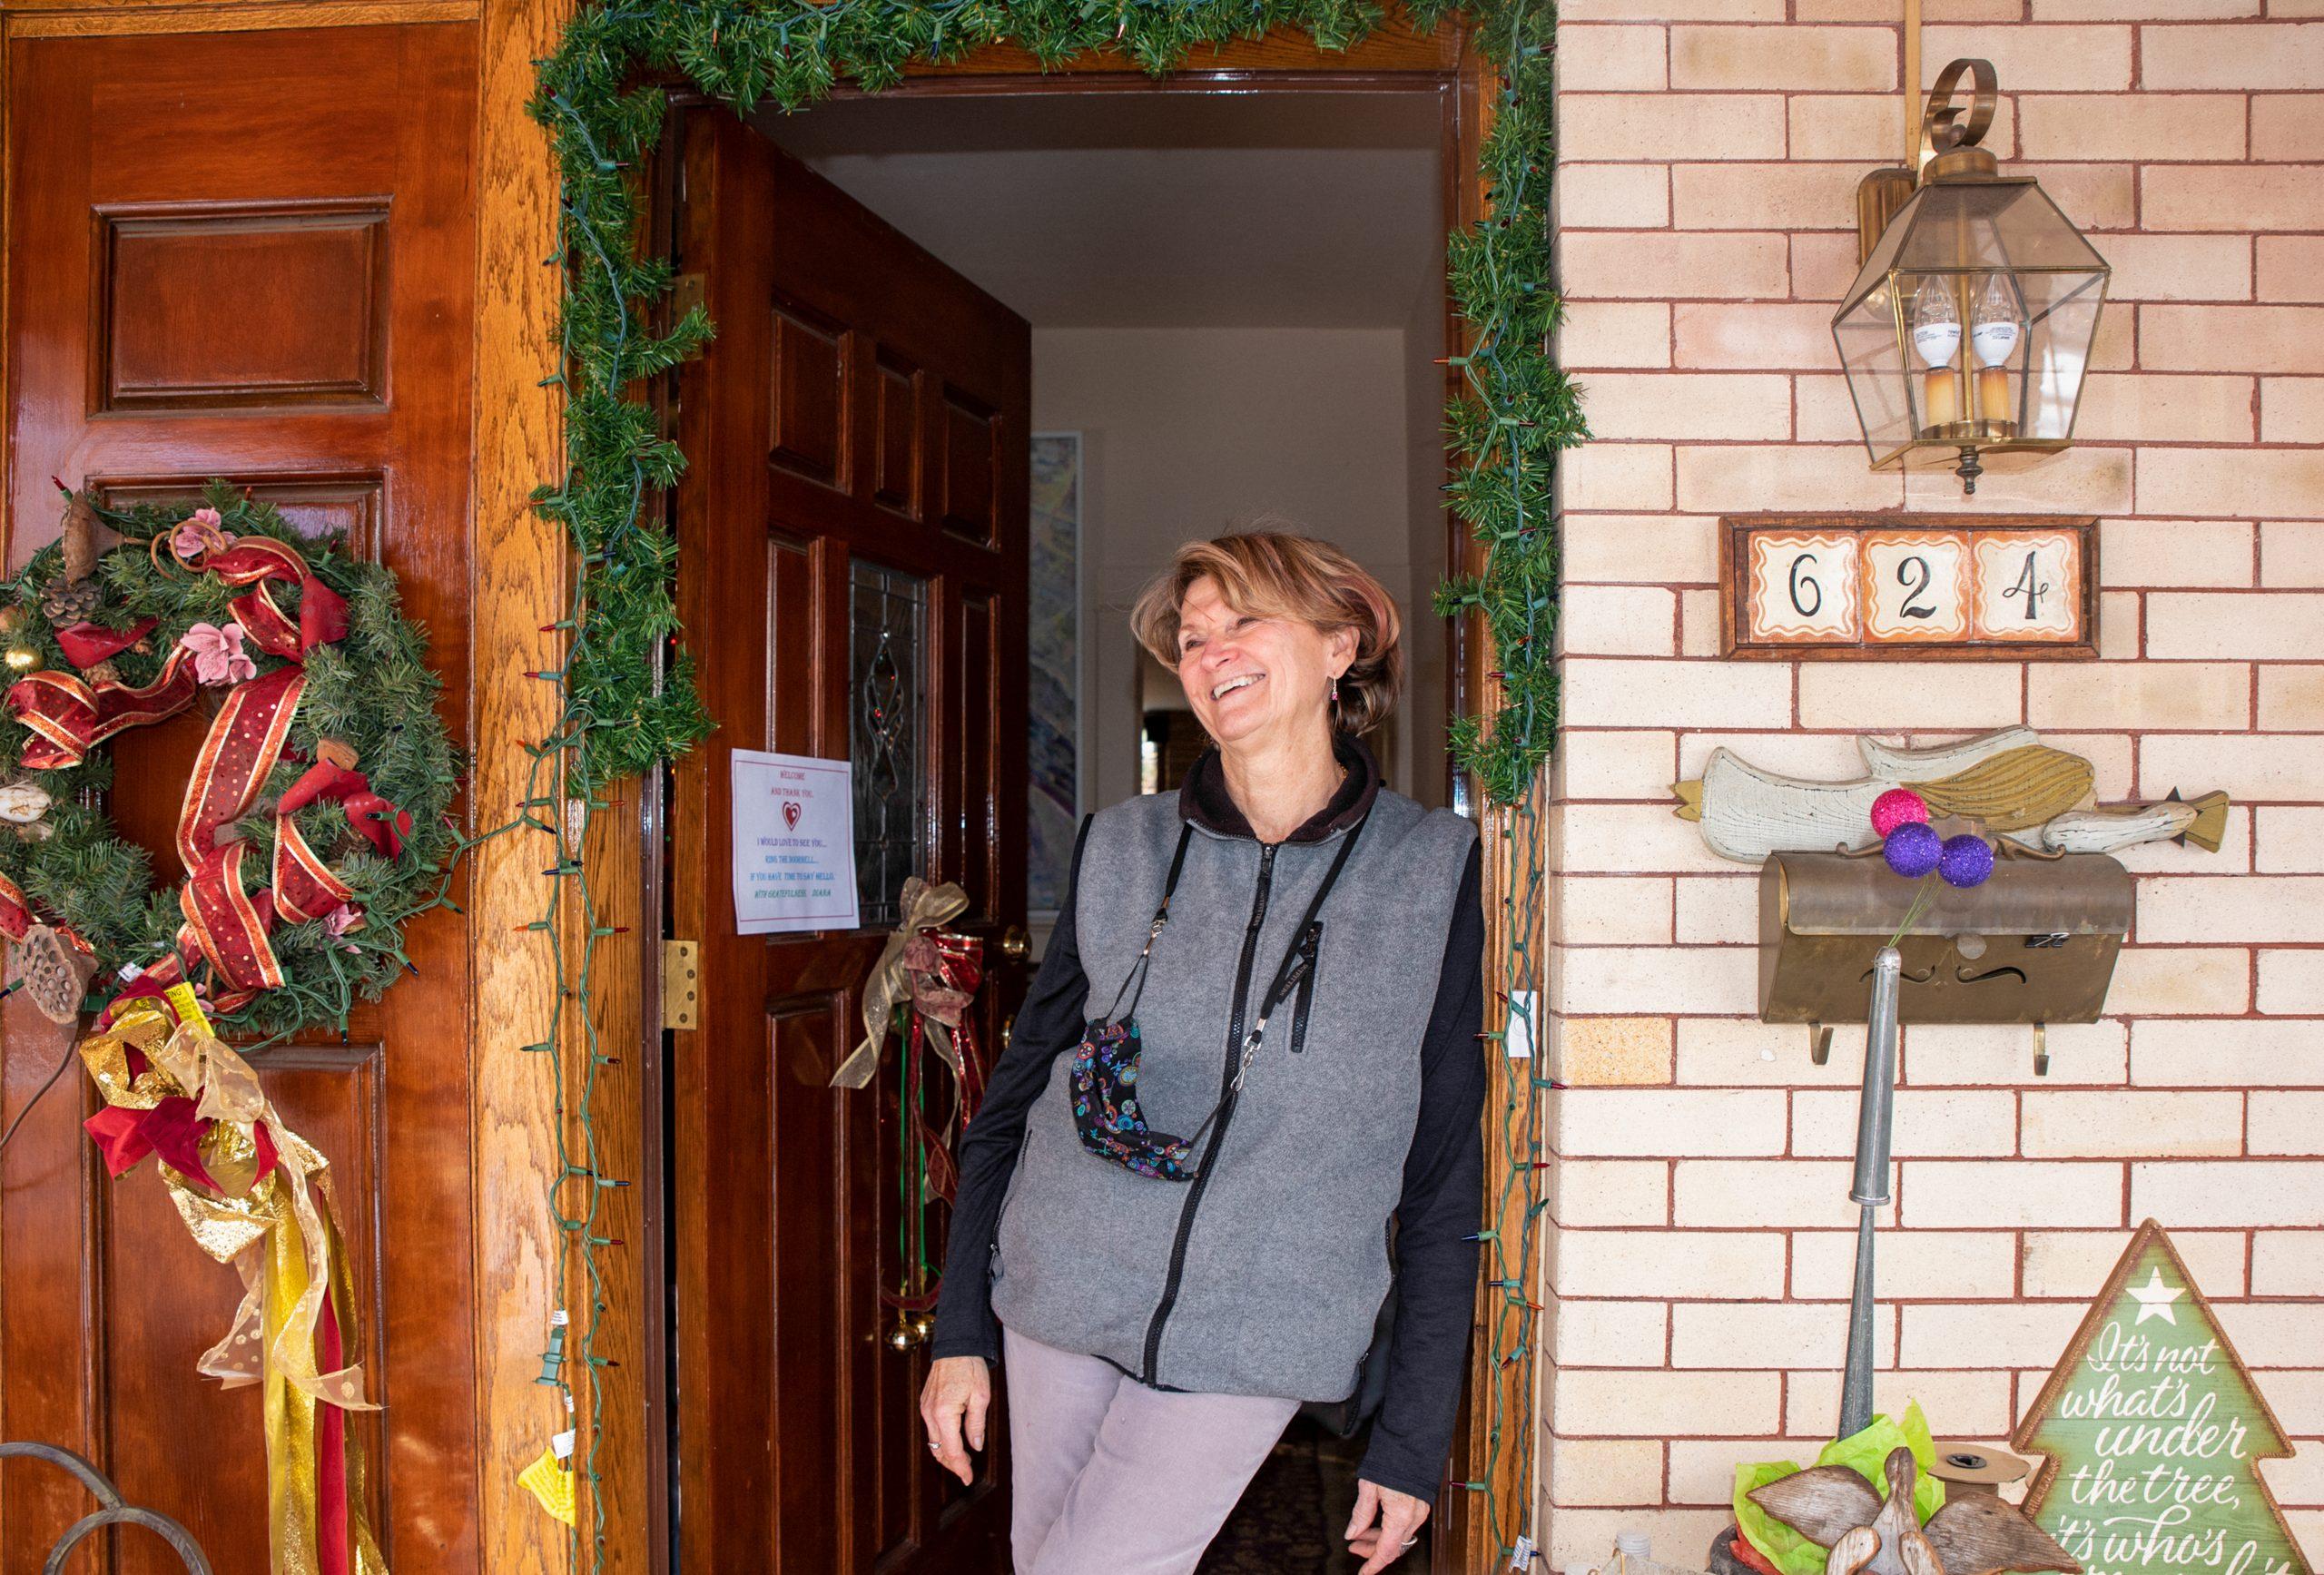 Volunteers offer a brighter future as Colorado experiences dual crises